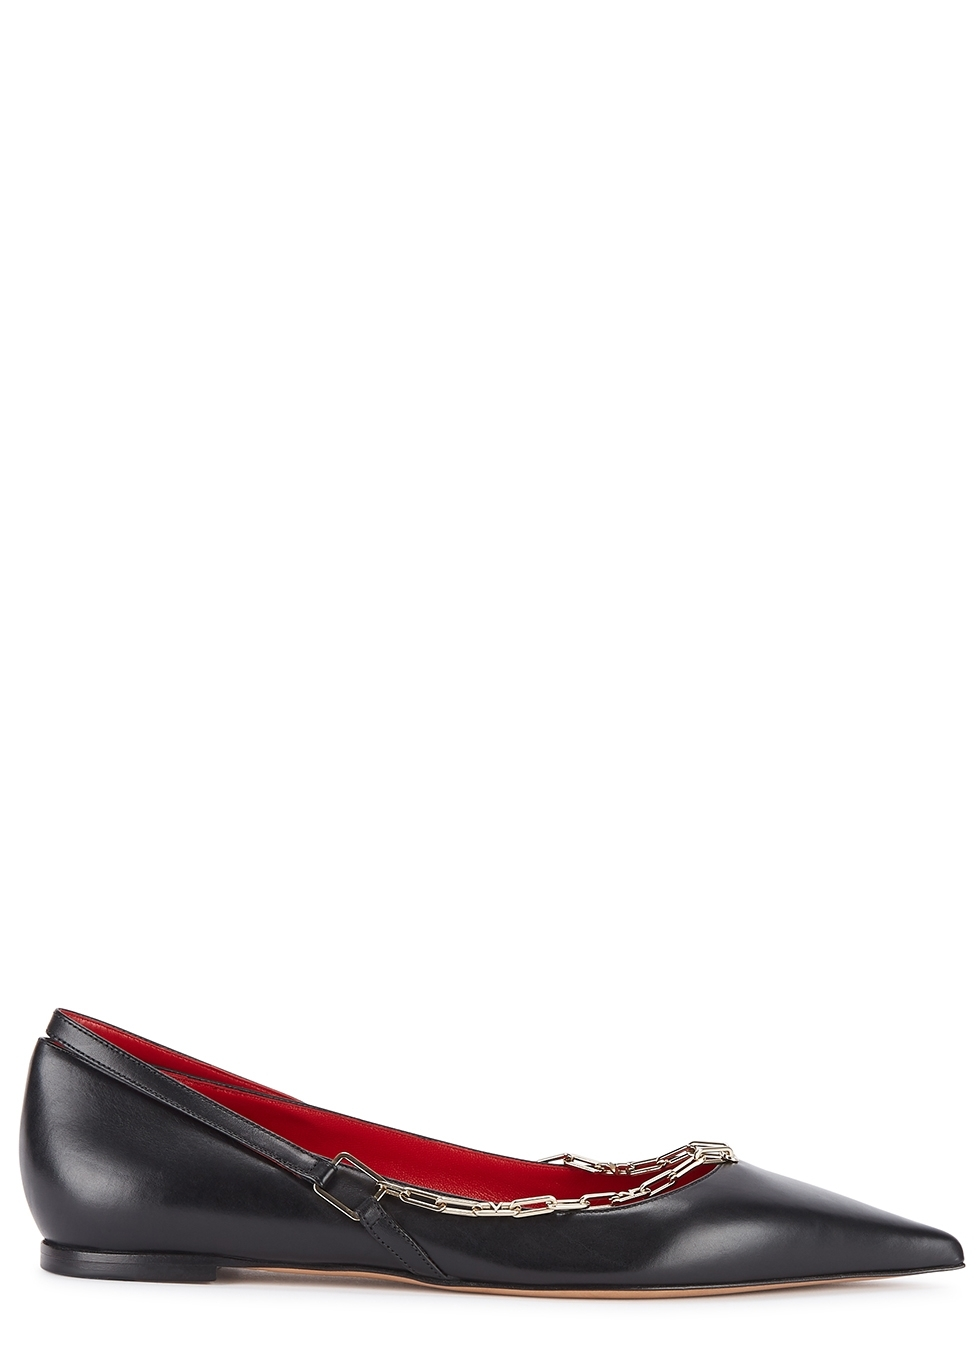 114ed55e0d5ed Women's Ballet Flats - Designer Shoes - Harvey Nichols